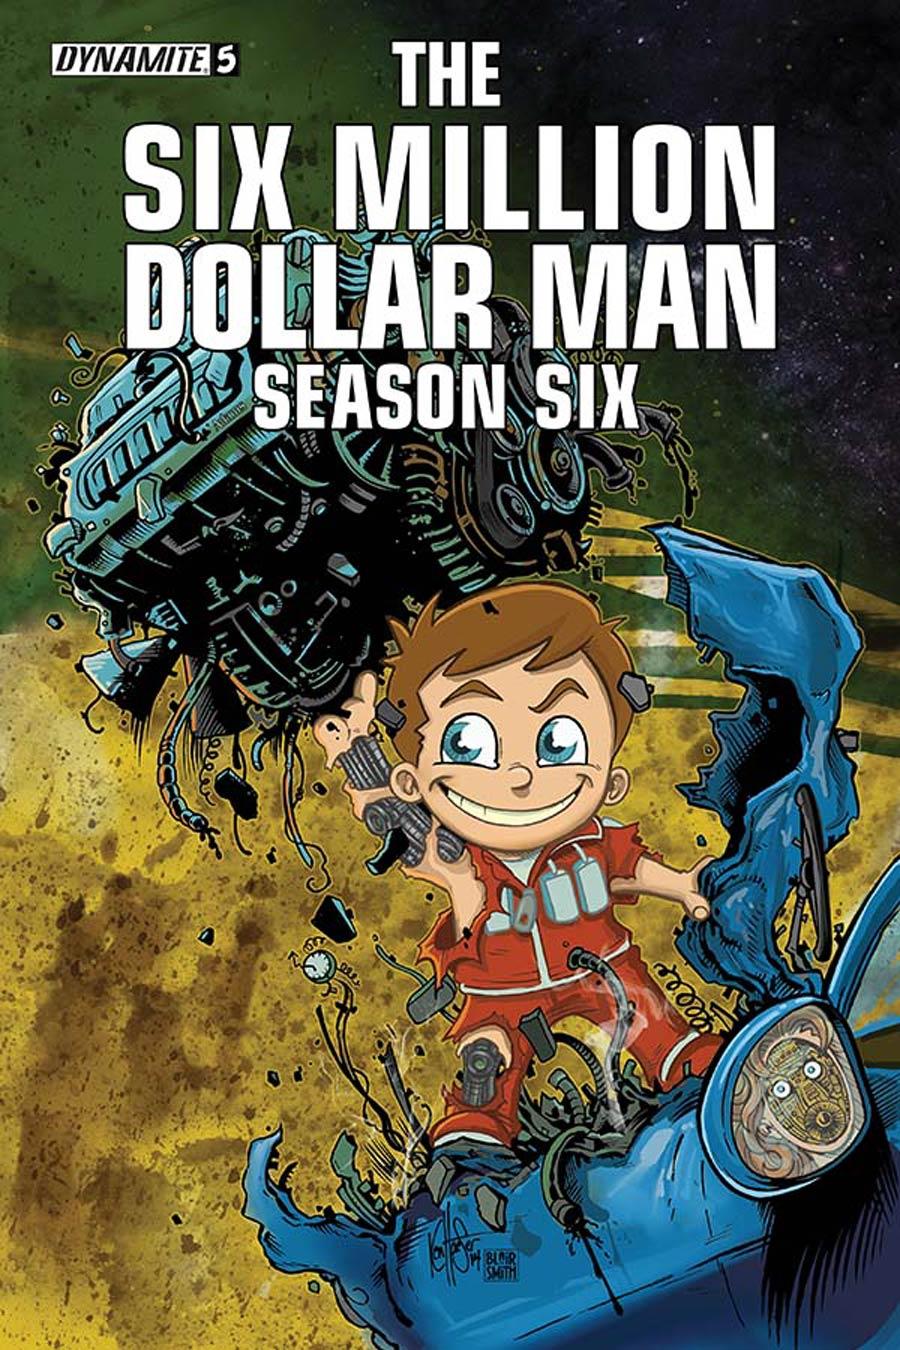 Six Million Dollar Man Season 6 #5 Cover B Variant Ken Haeser Lil Dollar Man Cover